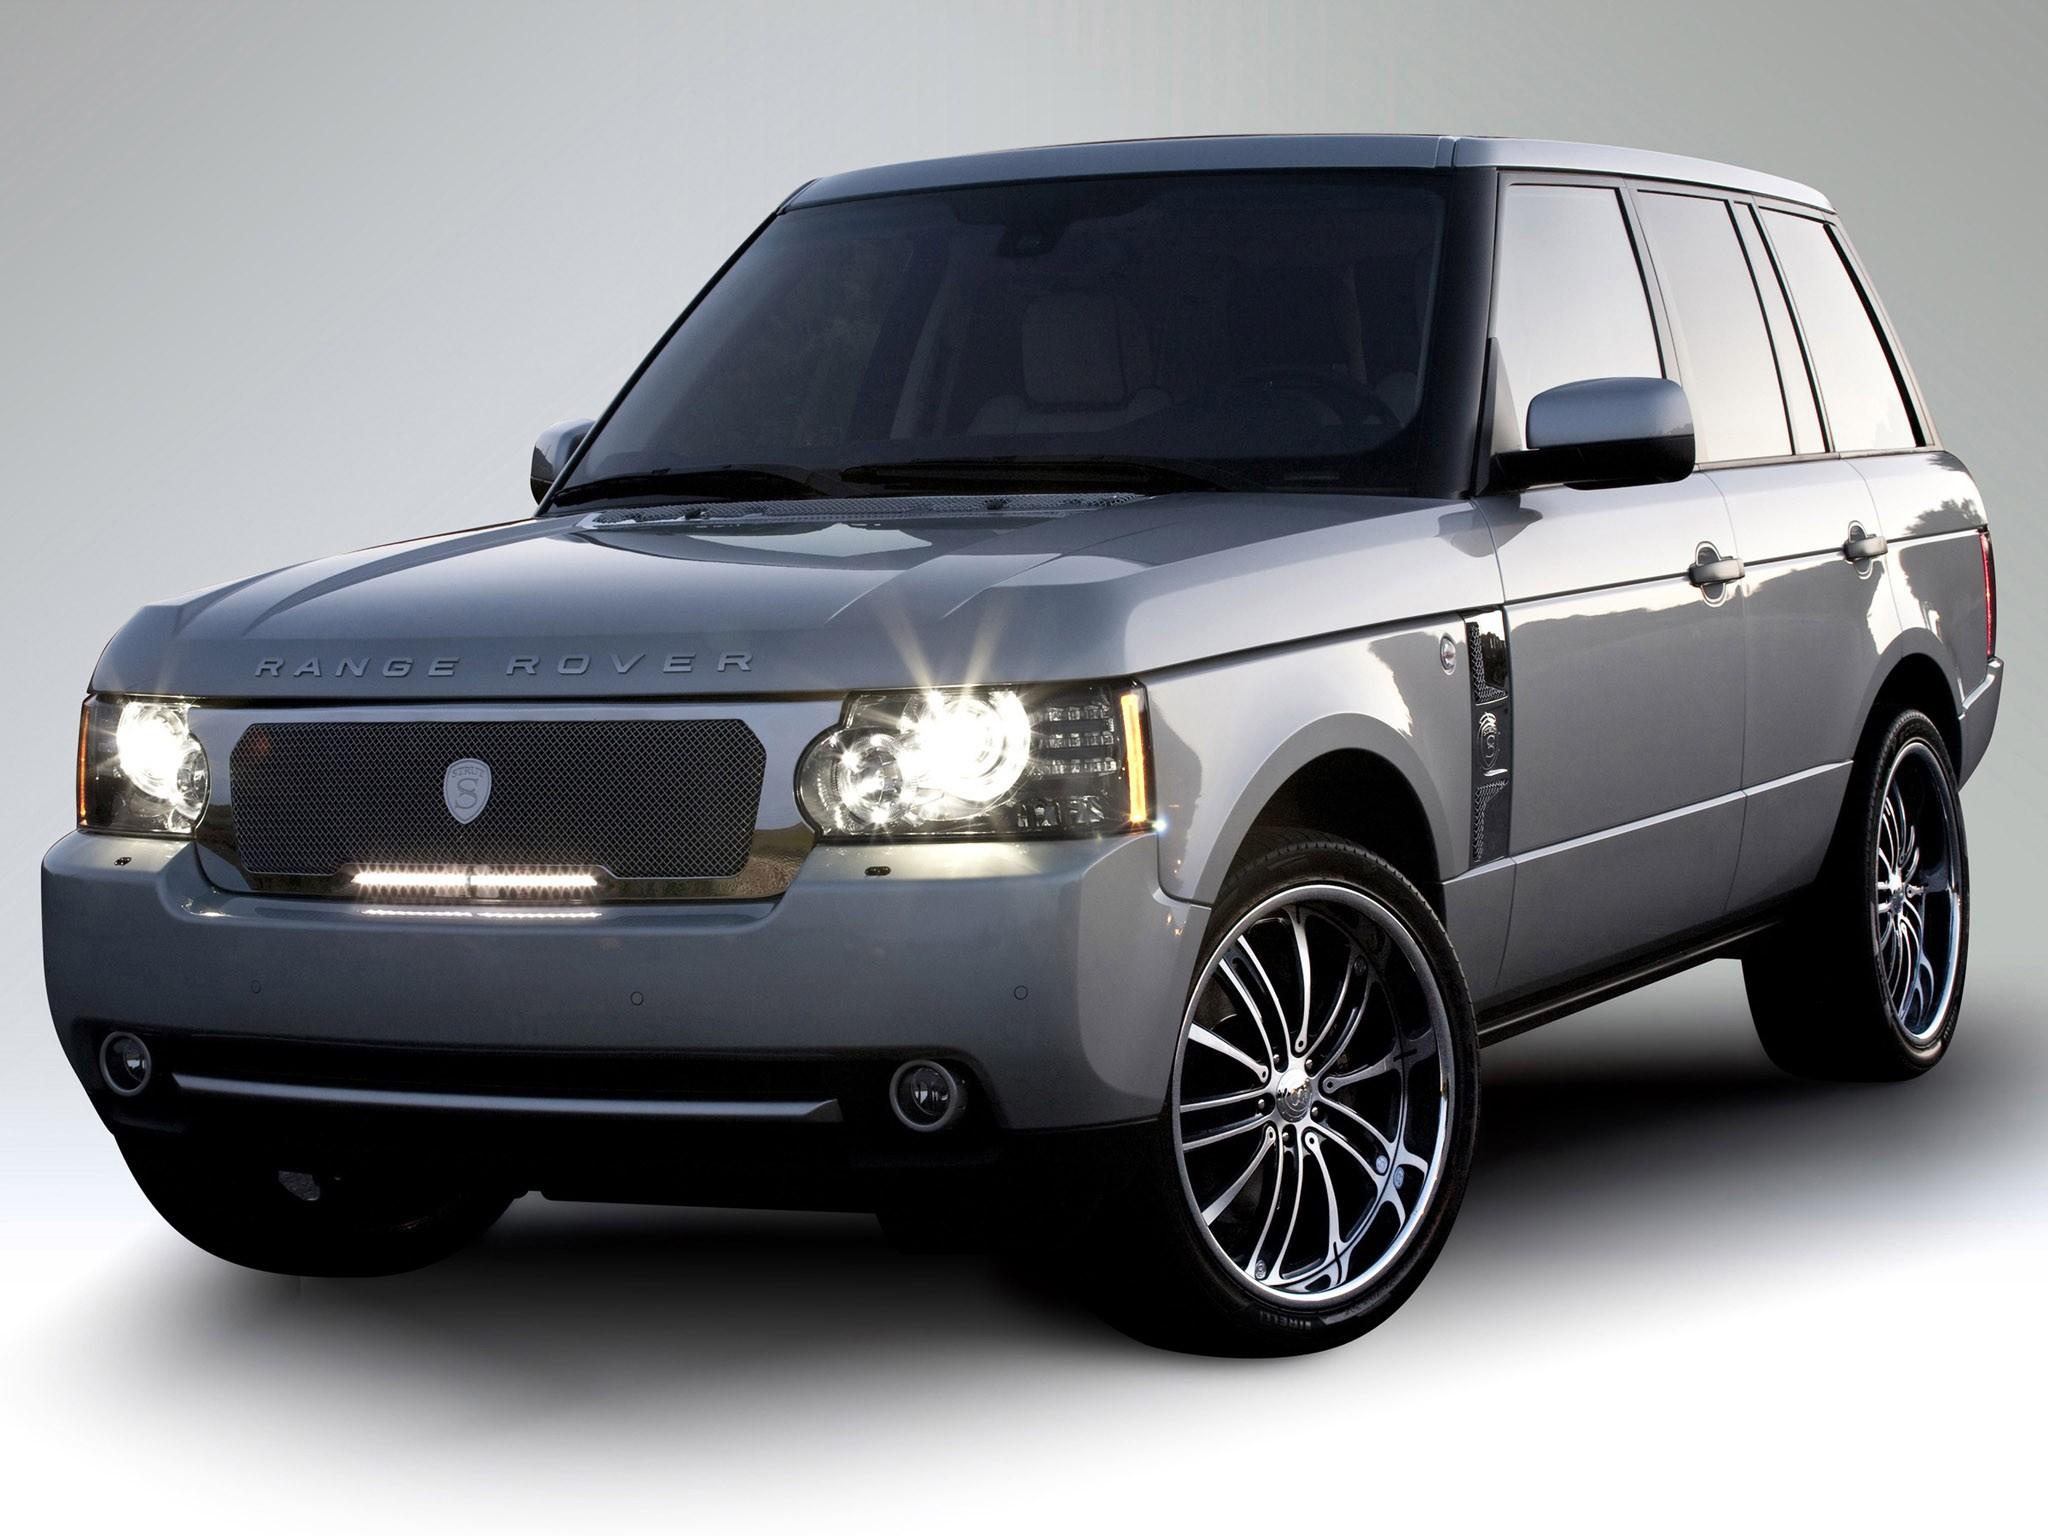 2010 Strut Range Rover Led Illuminated Grille Collection